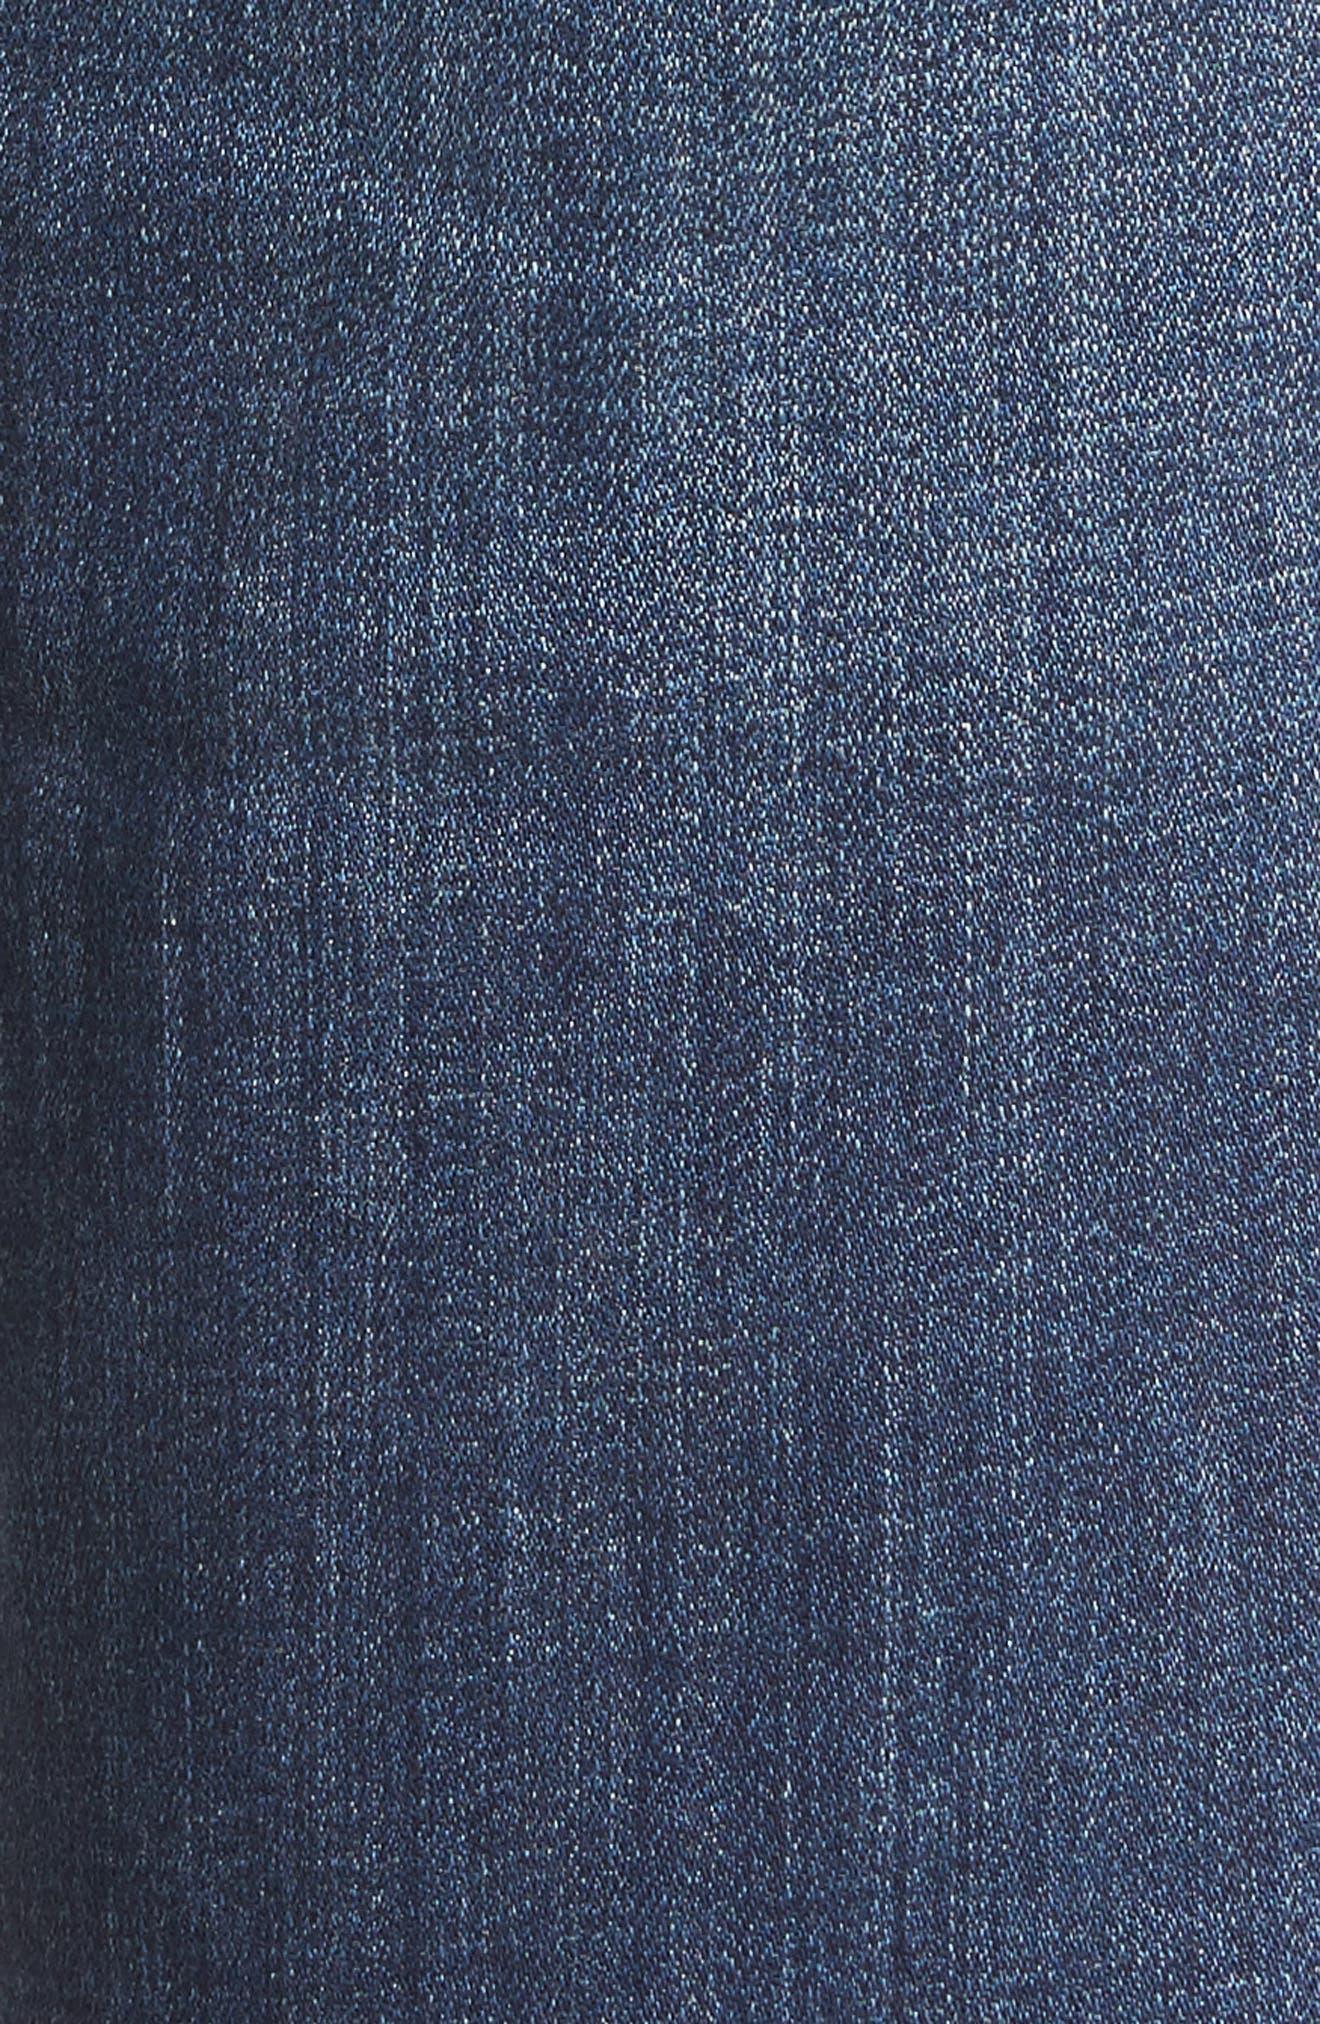 Carter Cuffed Stretch Girlfriend Jeans,                             Alternate thumbnail 5, color,                             MEDIUM INDIGO